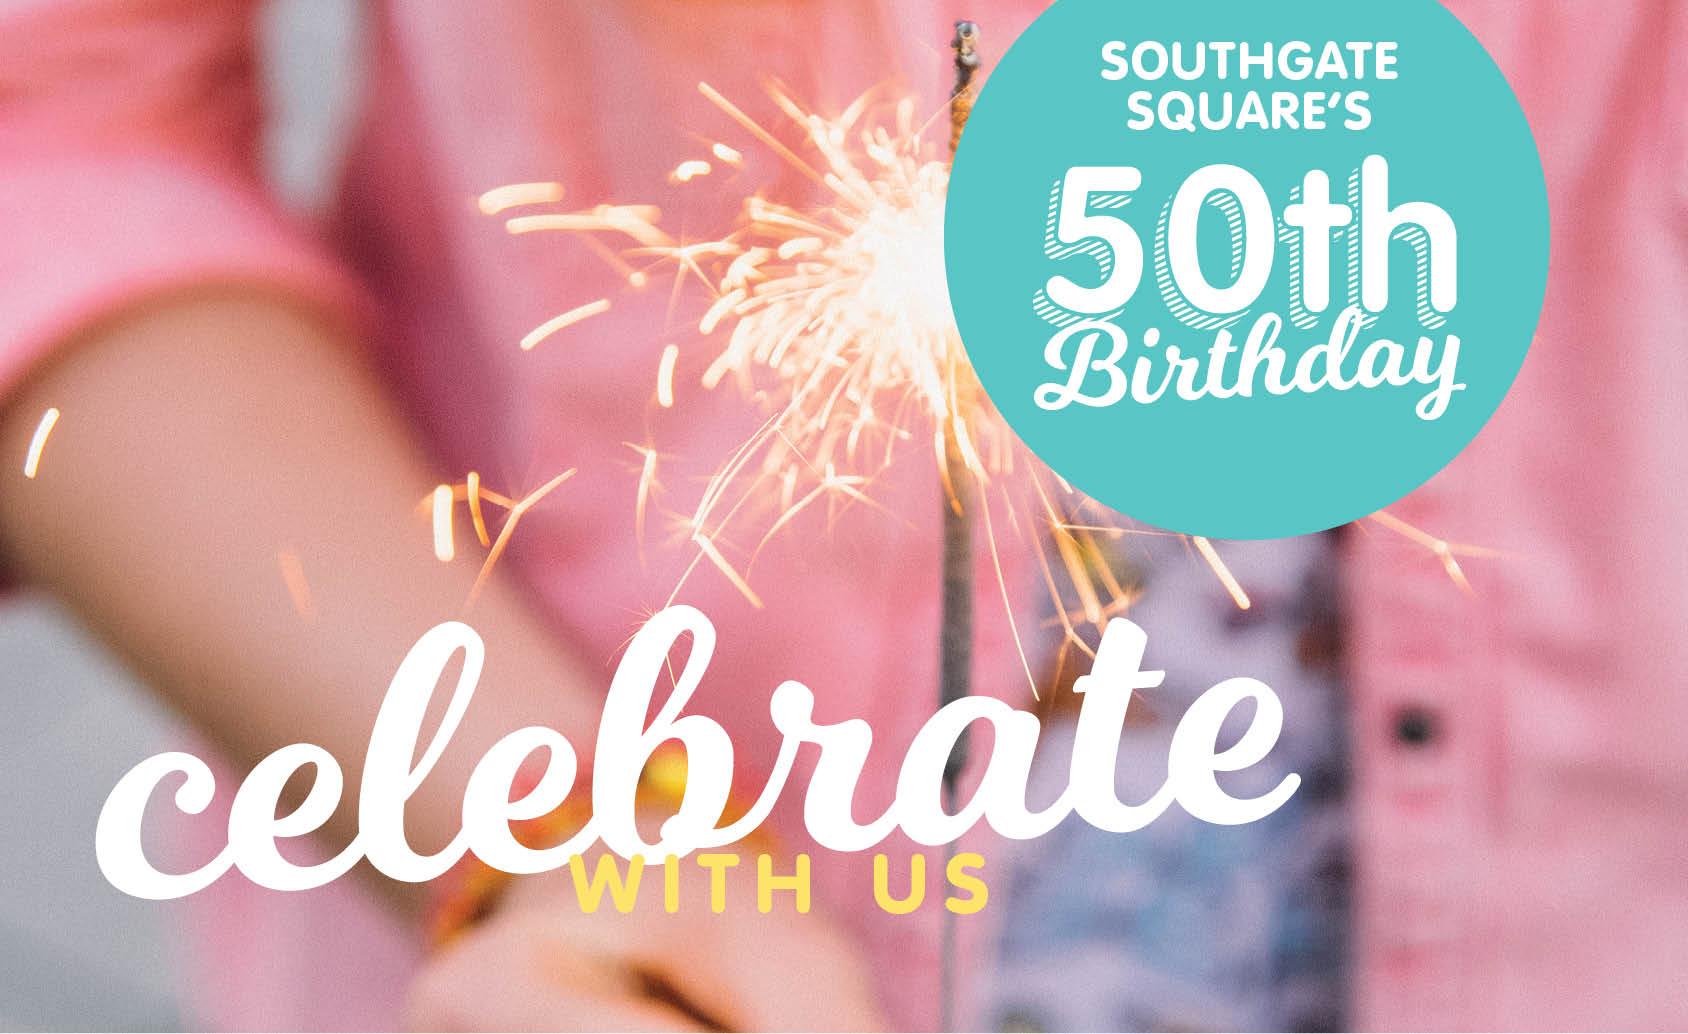 CH4336_Charter Hall_Southgate__Web Tiles_Celebrate_844x517